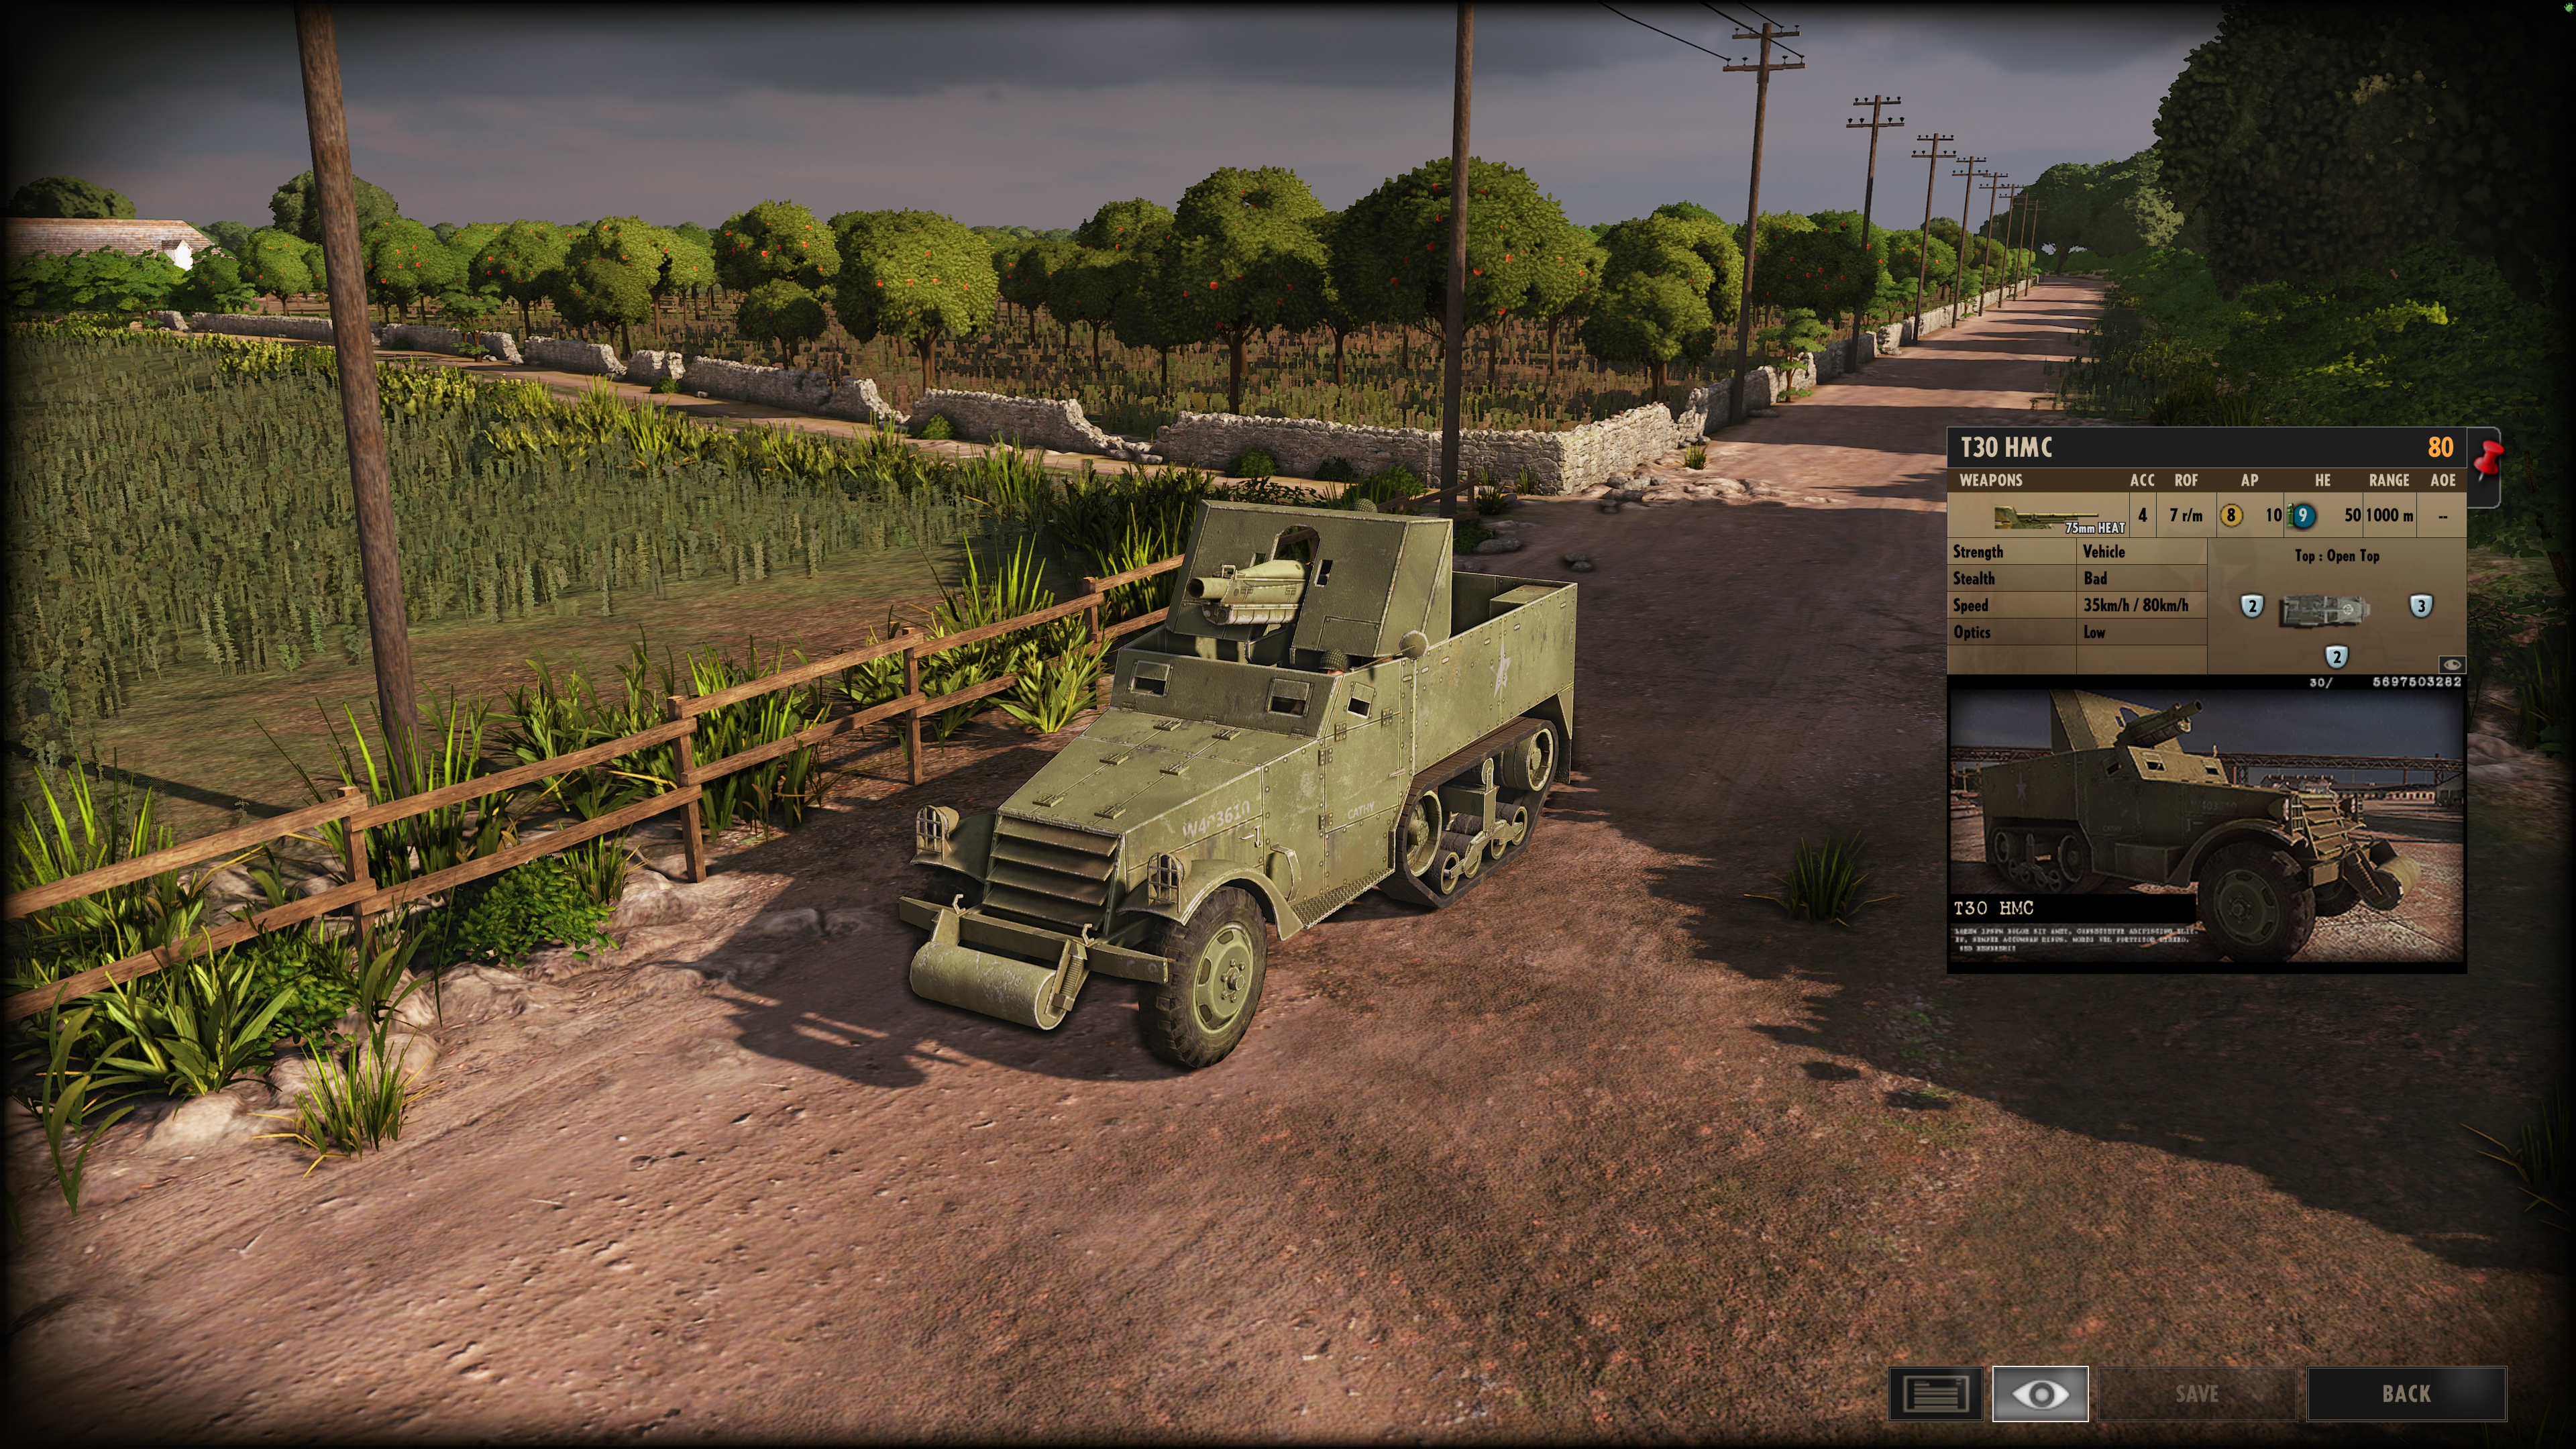 Steel Division: Normandy 44 - Anti-Tank Gameplay T30HMC